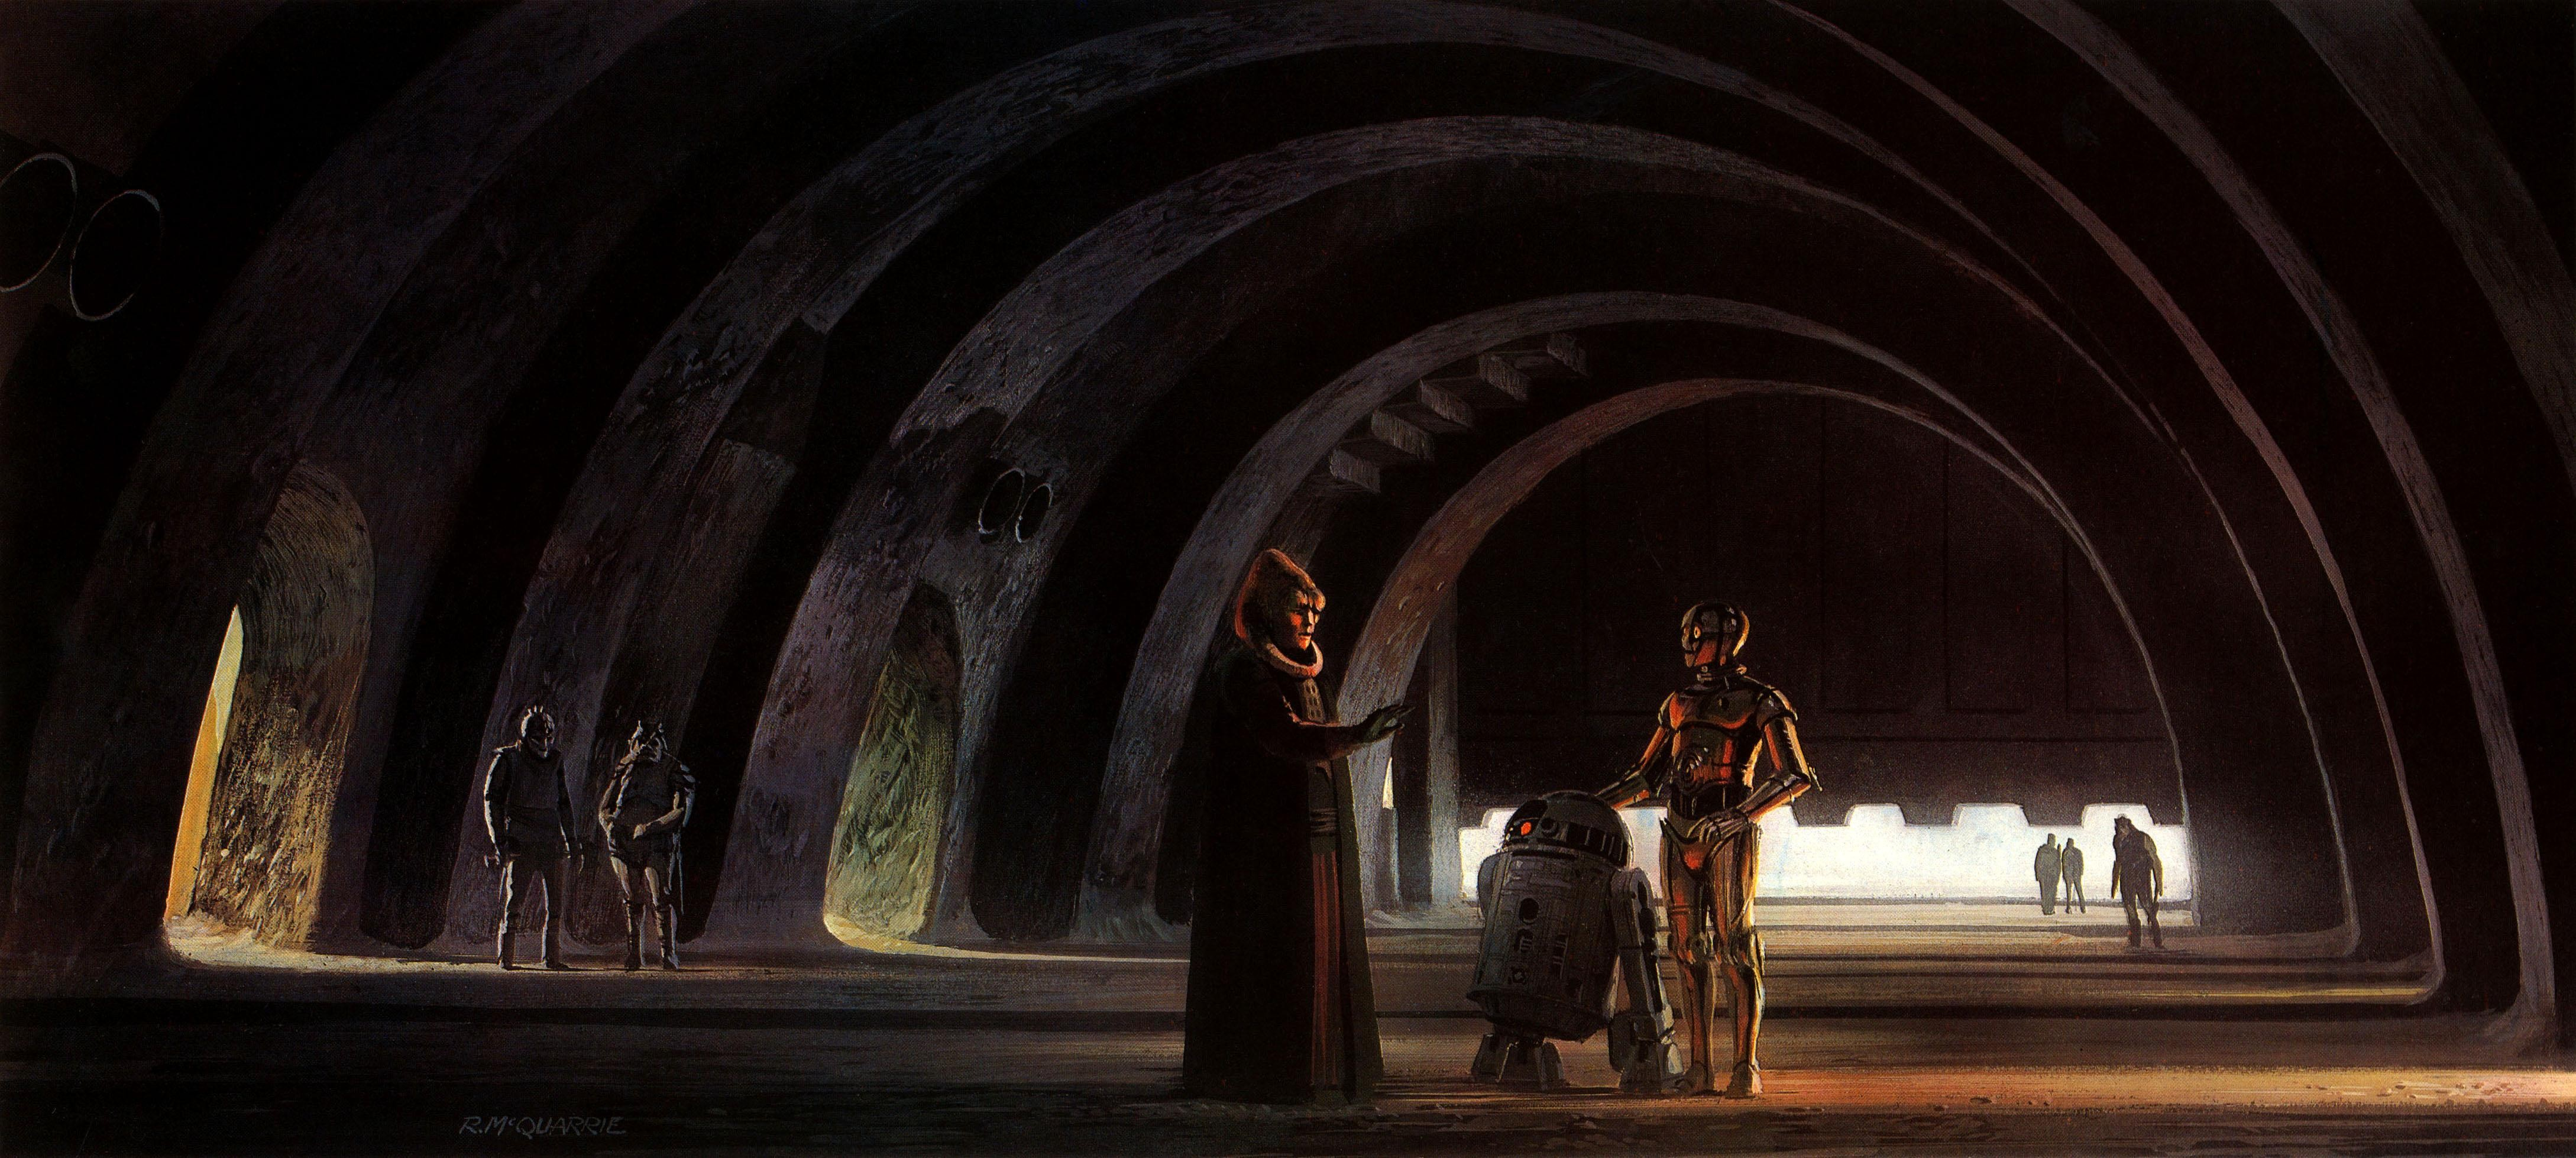 General 4356x1958 Star Wars Star Wars Droids science fiction artwork